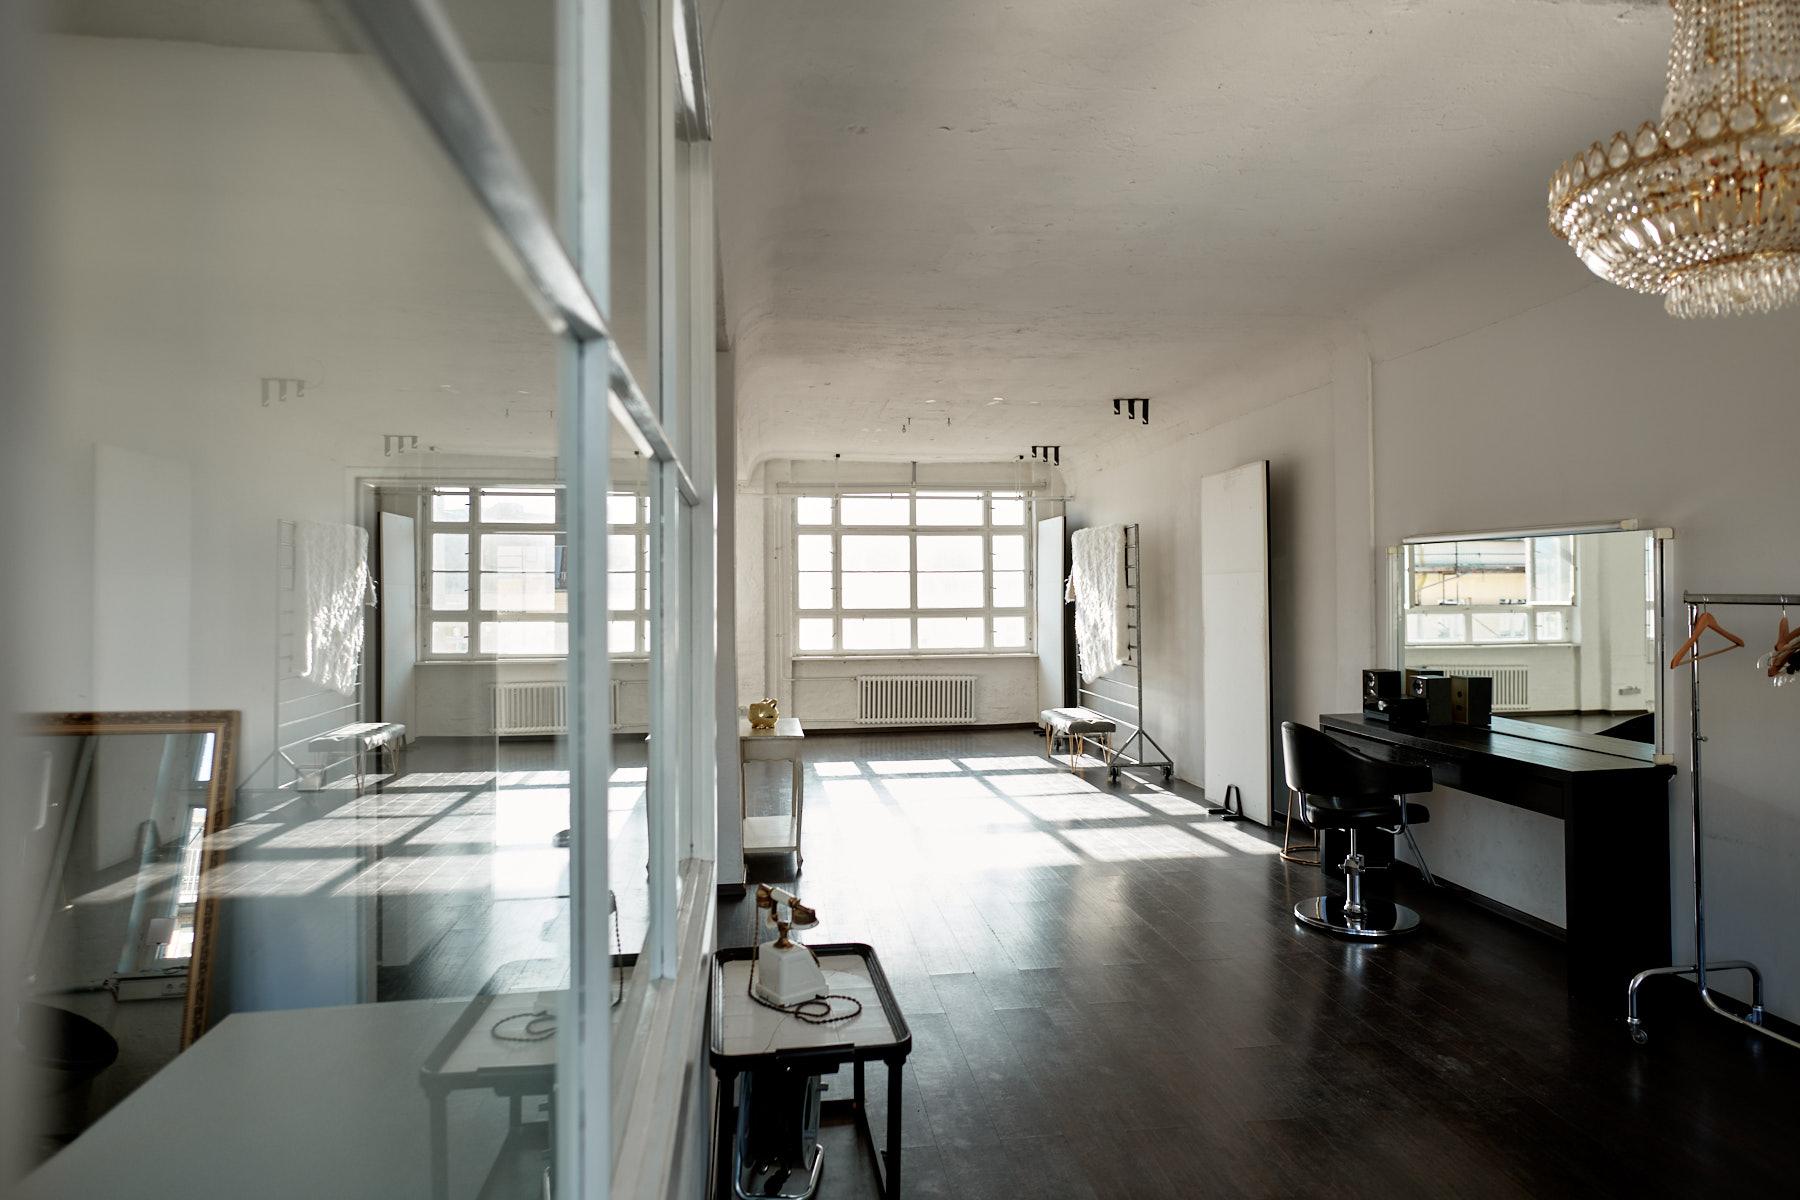 Stühle im Mietstudio Berlin Tageslichtstudio